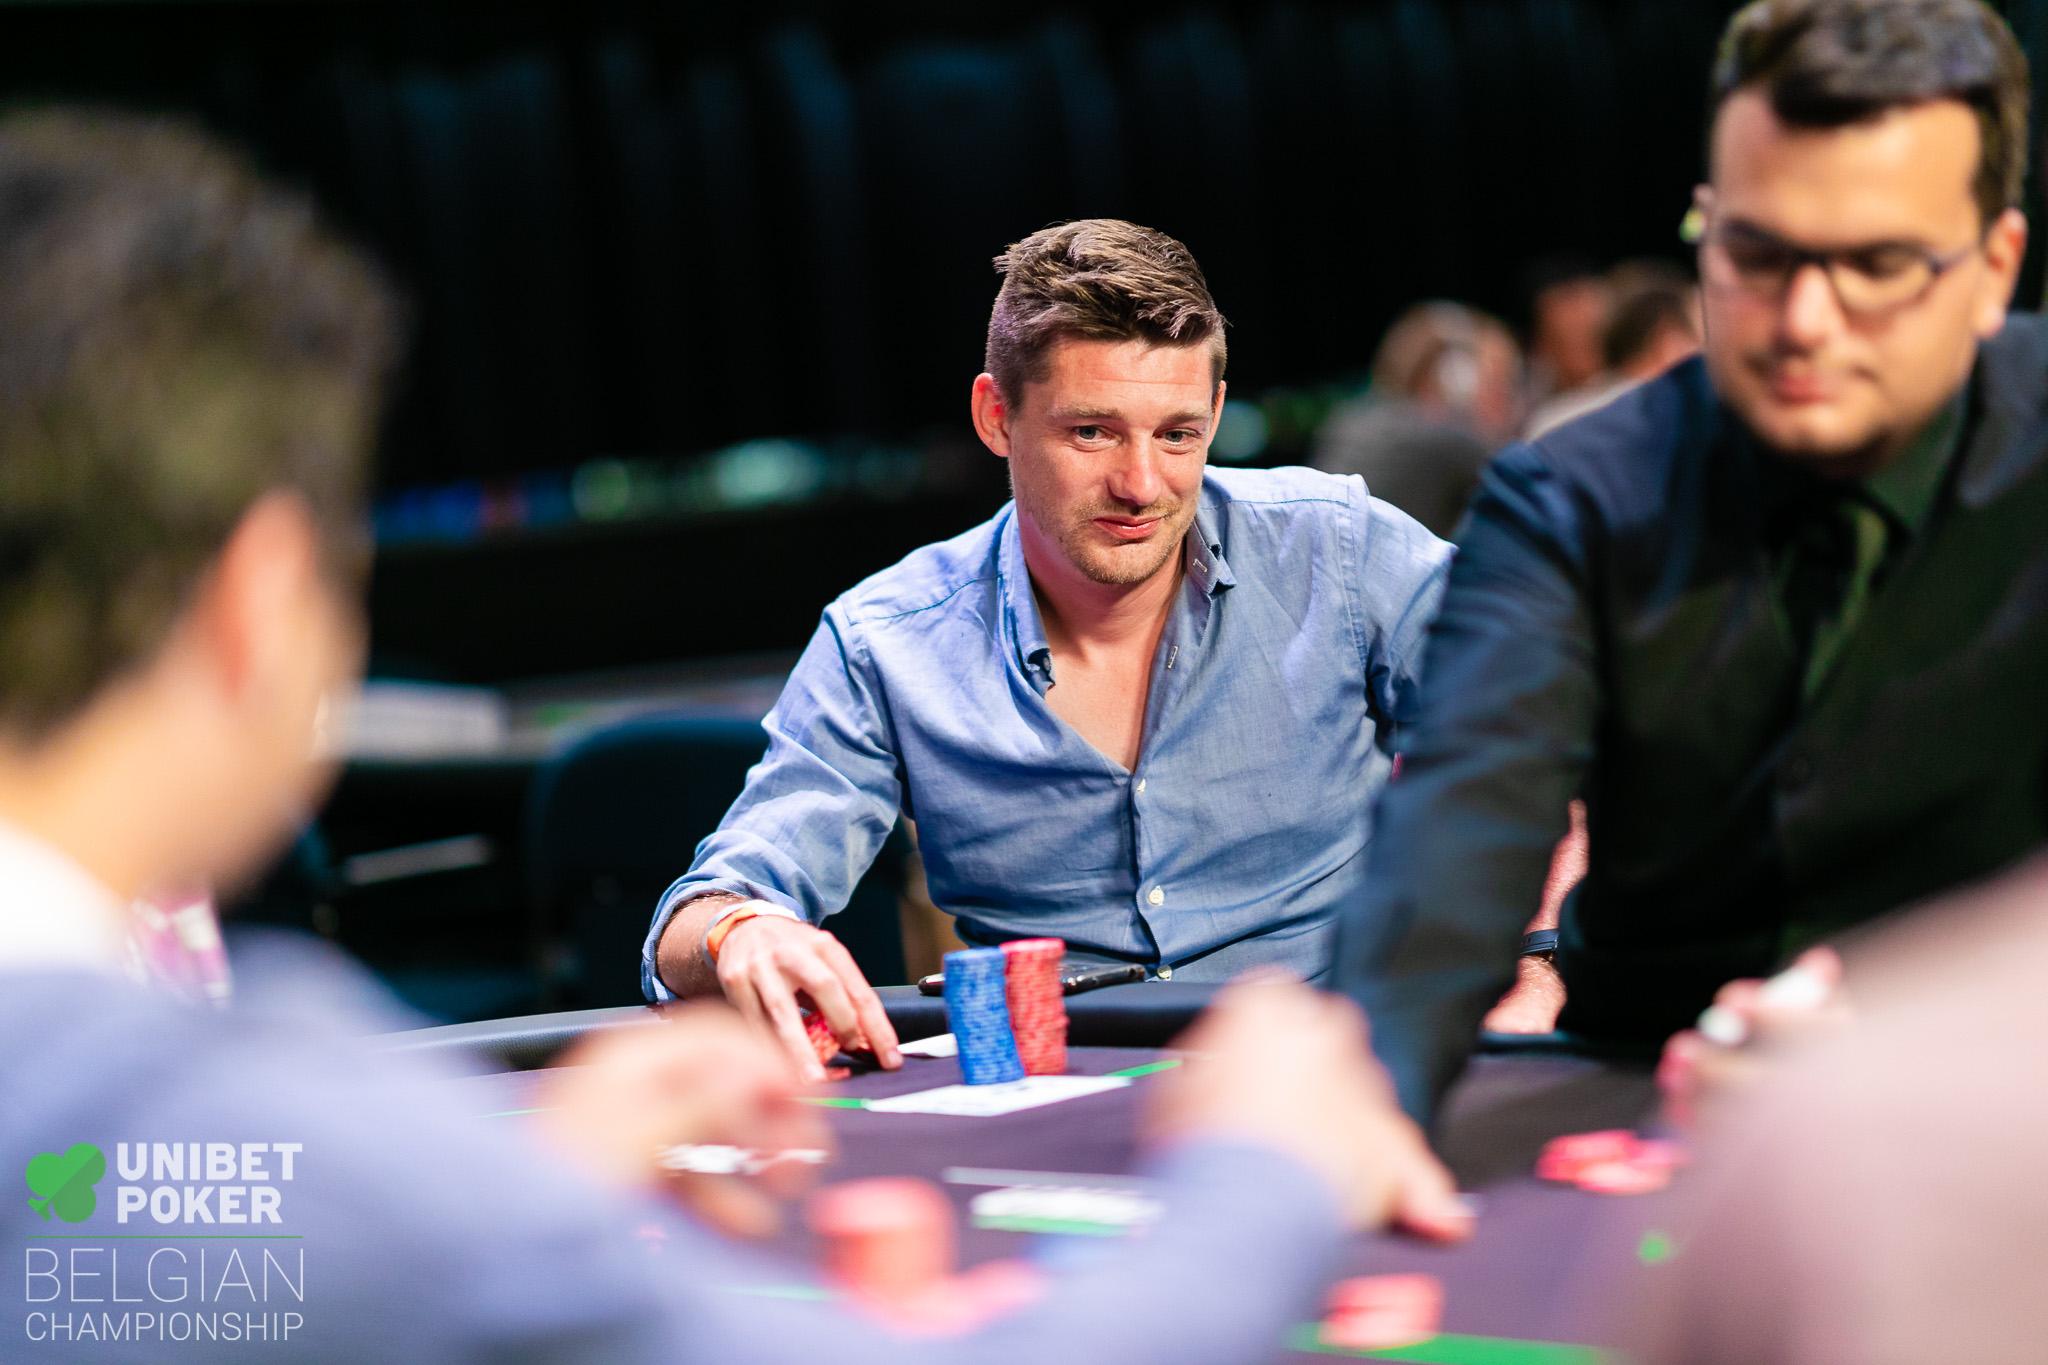 Unibet Poker Belgian Championship 2019 - Main Event (Day 2) 023 Glenn Laureys ((C) Tambet Kask 2019)